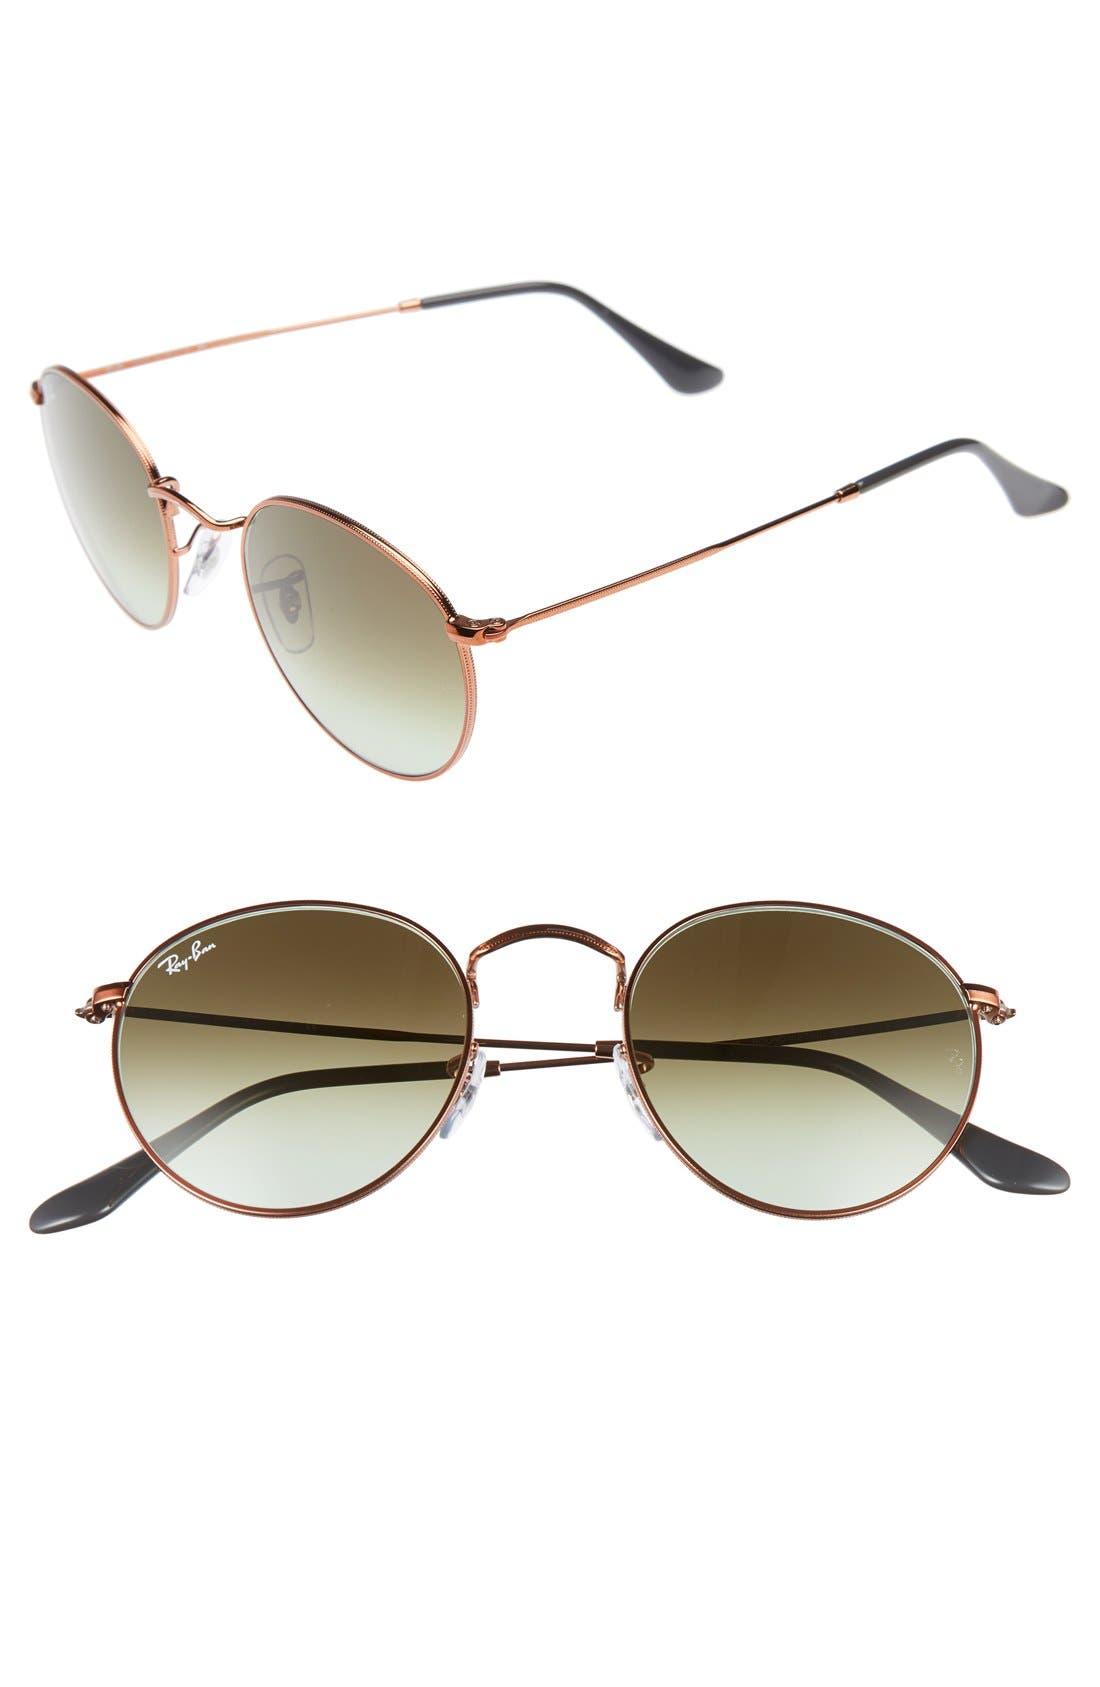 Icons 50mm Retro Sunglasses,                             Main thumbnail 1, color,